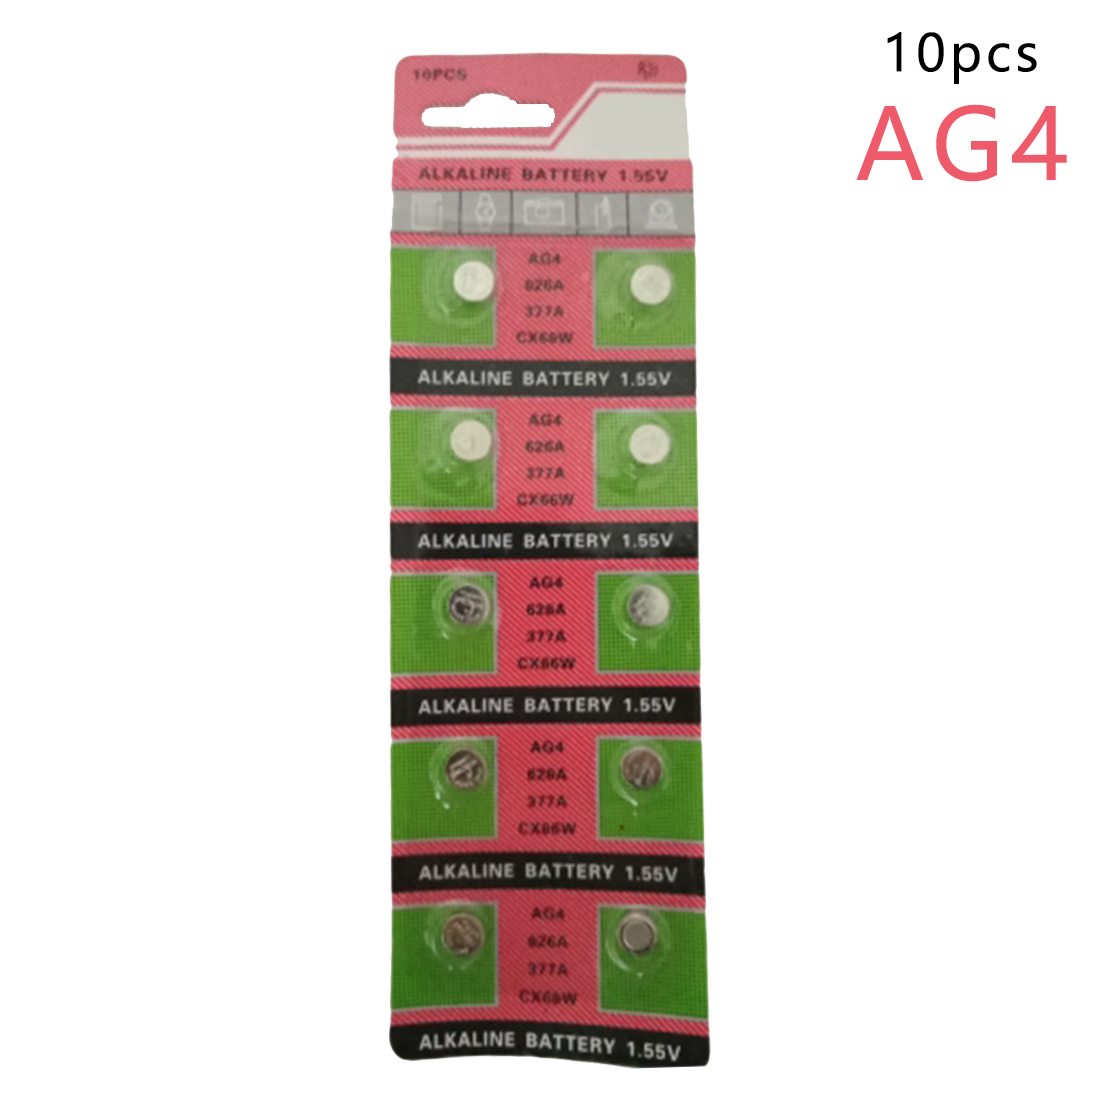 Centechia High Quality Wholesale 10PCS/lot =1cards AG4 377A 377 LR626 SR626SW SR66 LR66 Button Cell Watch Coin Battery